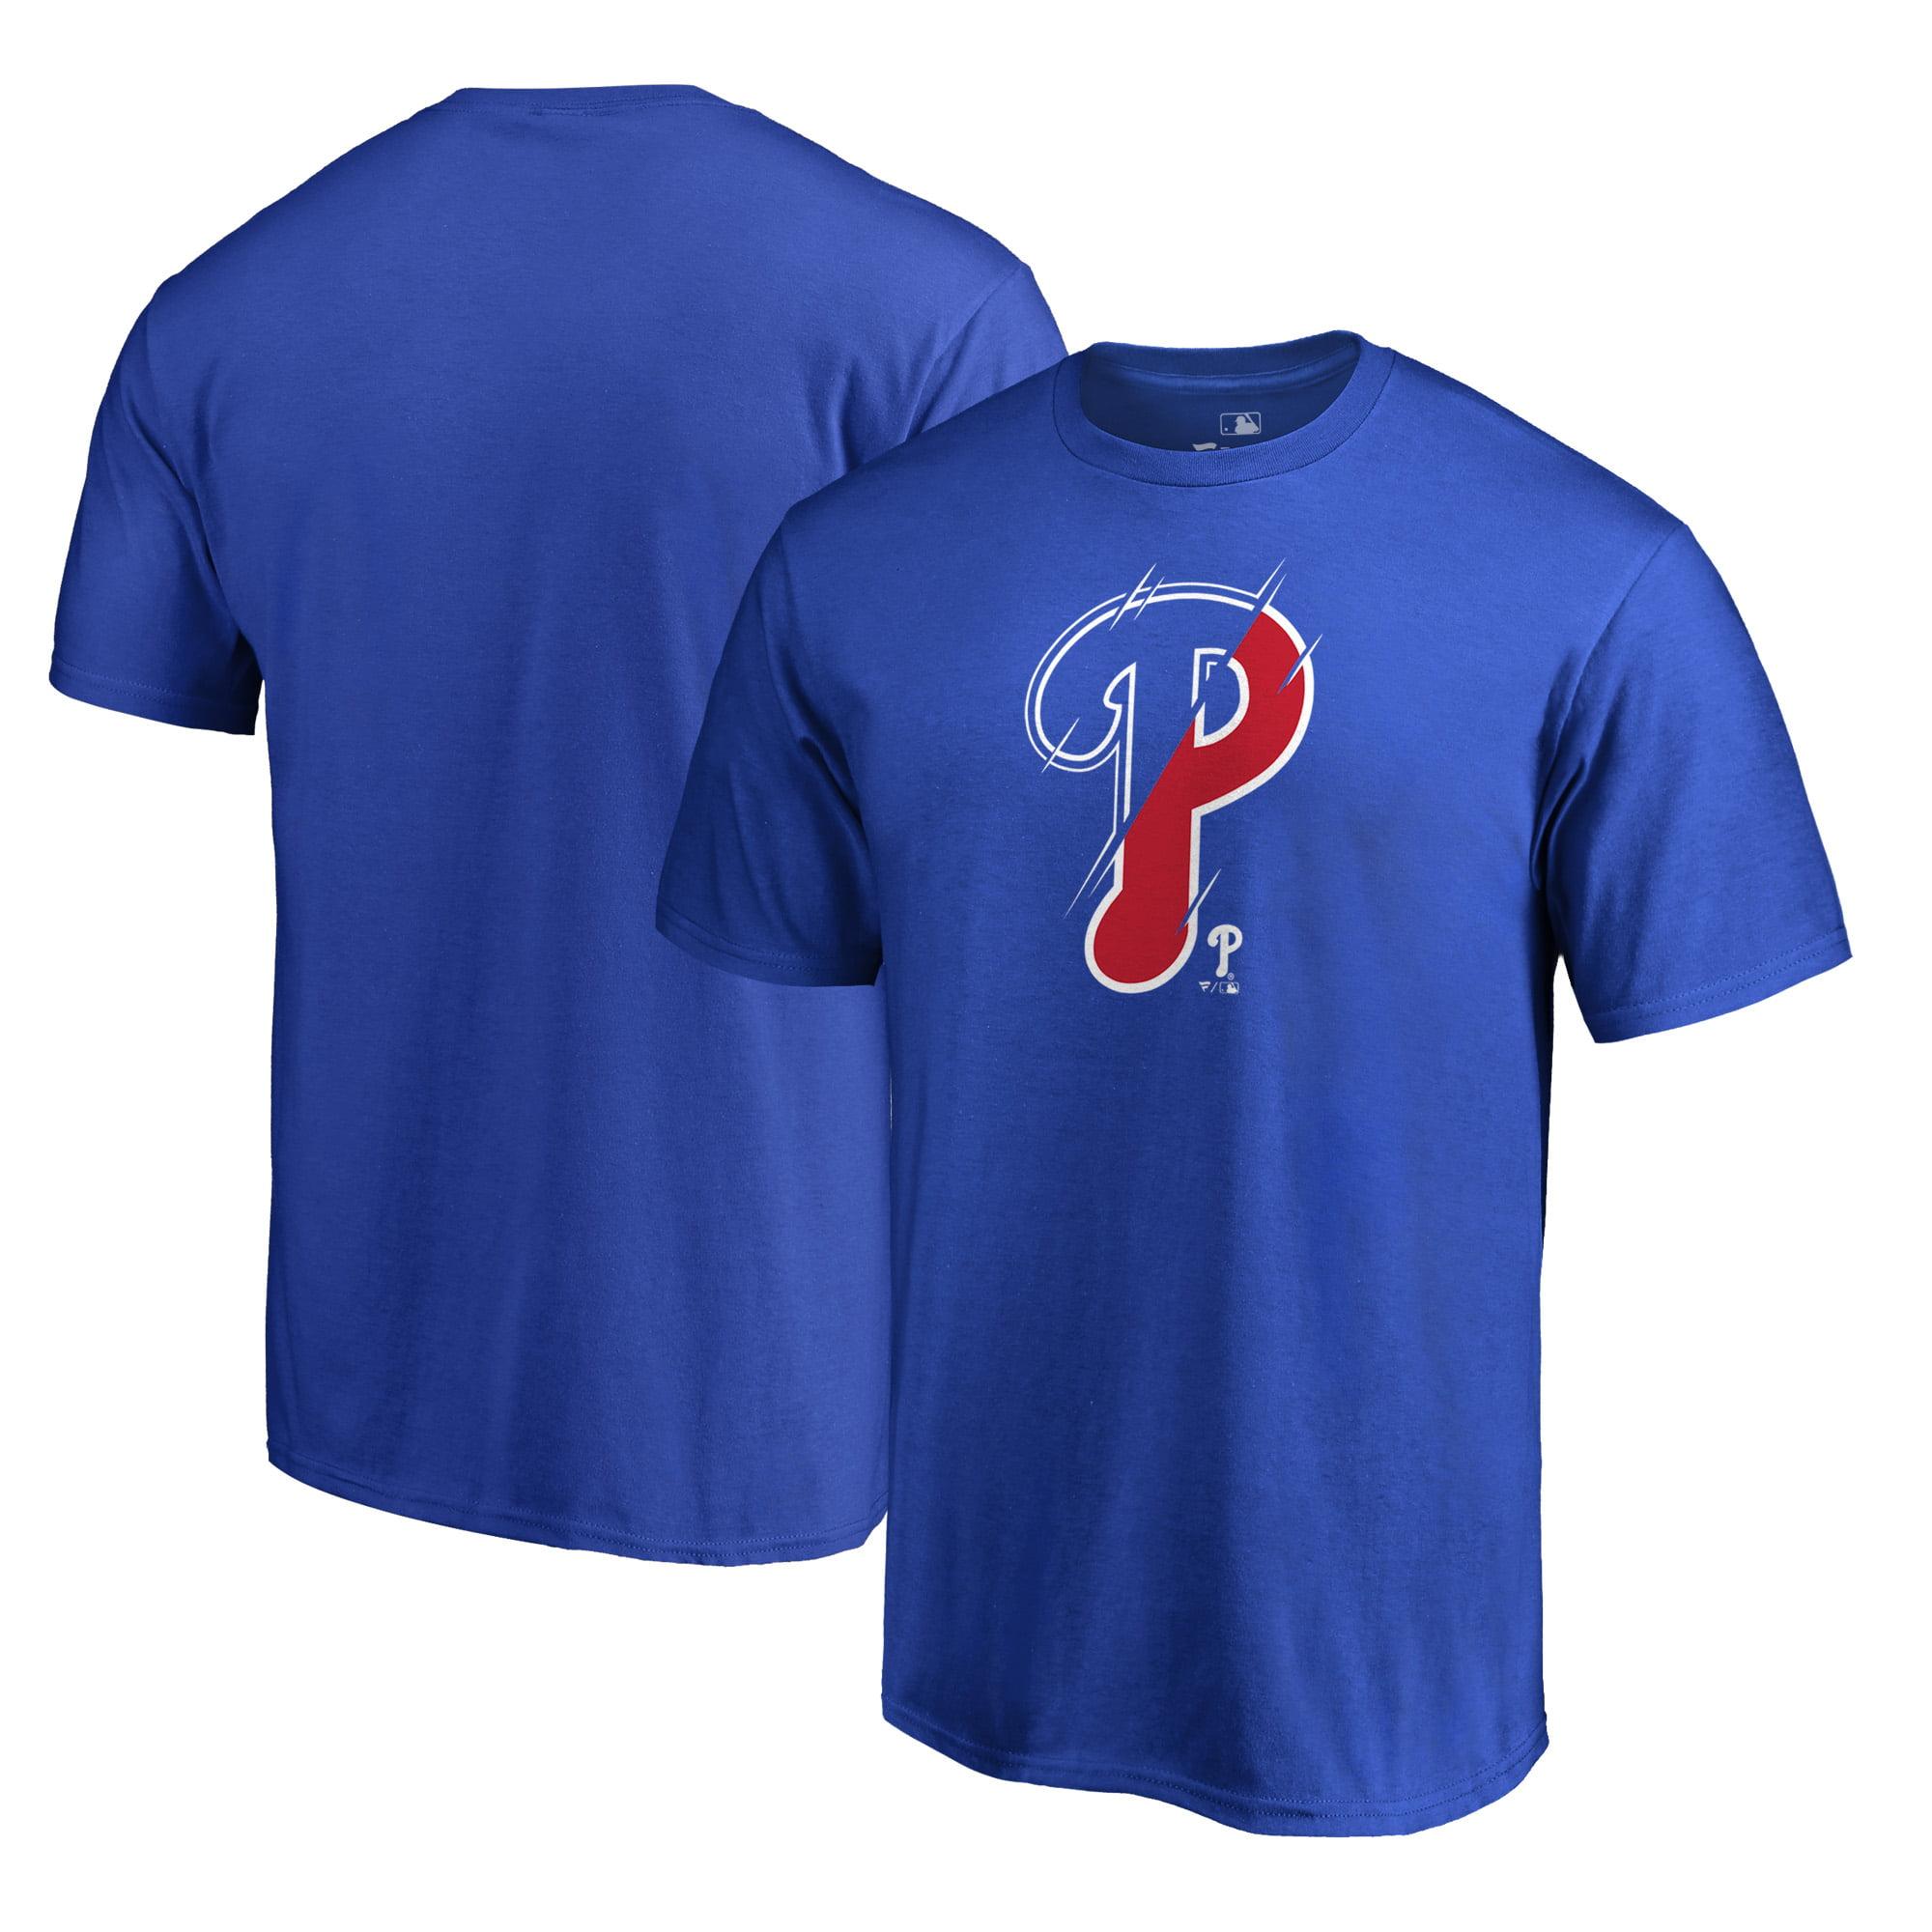 Philadelphia Phillies Fanatics Branded X-Ray T-Shirt - Royal